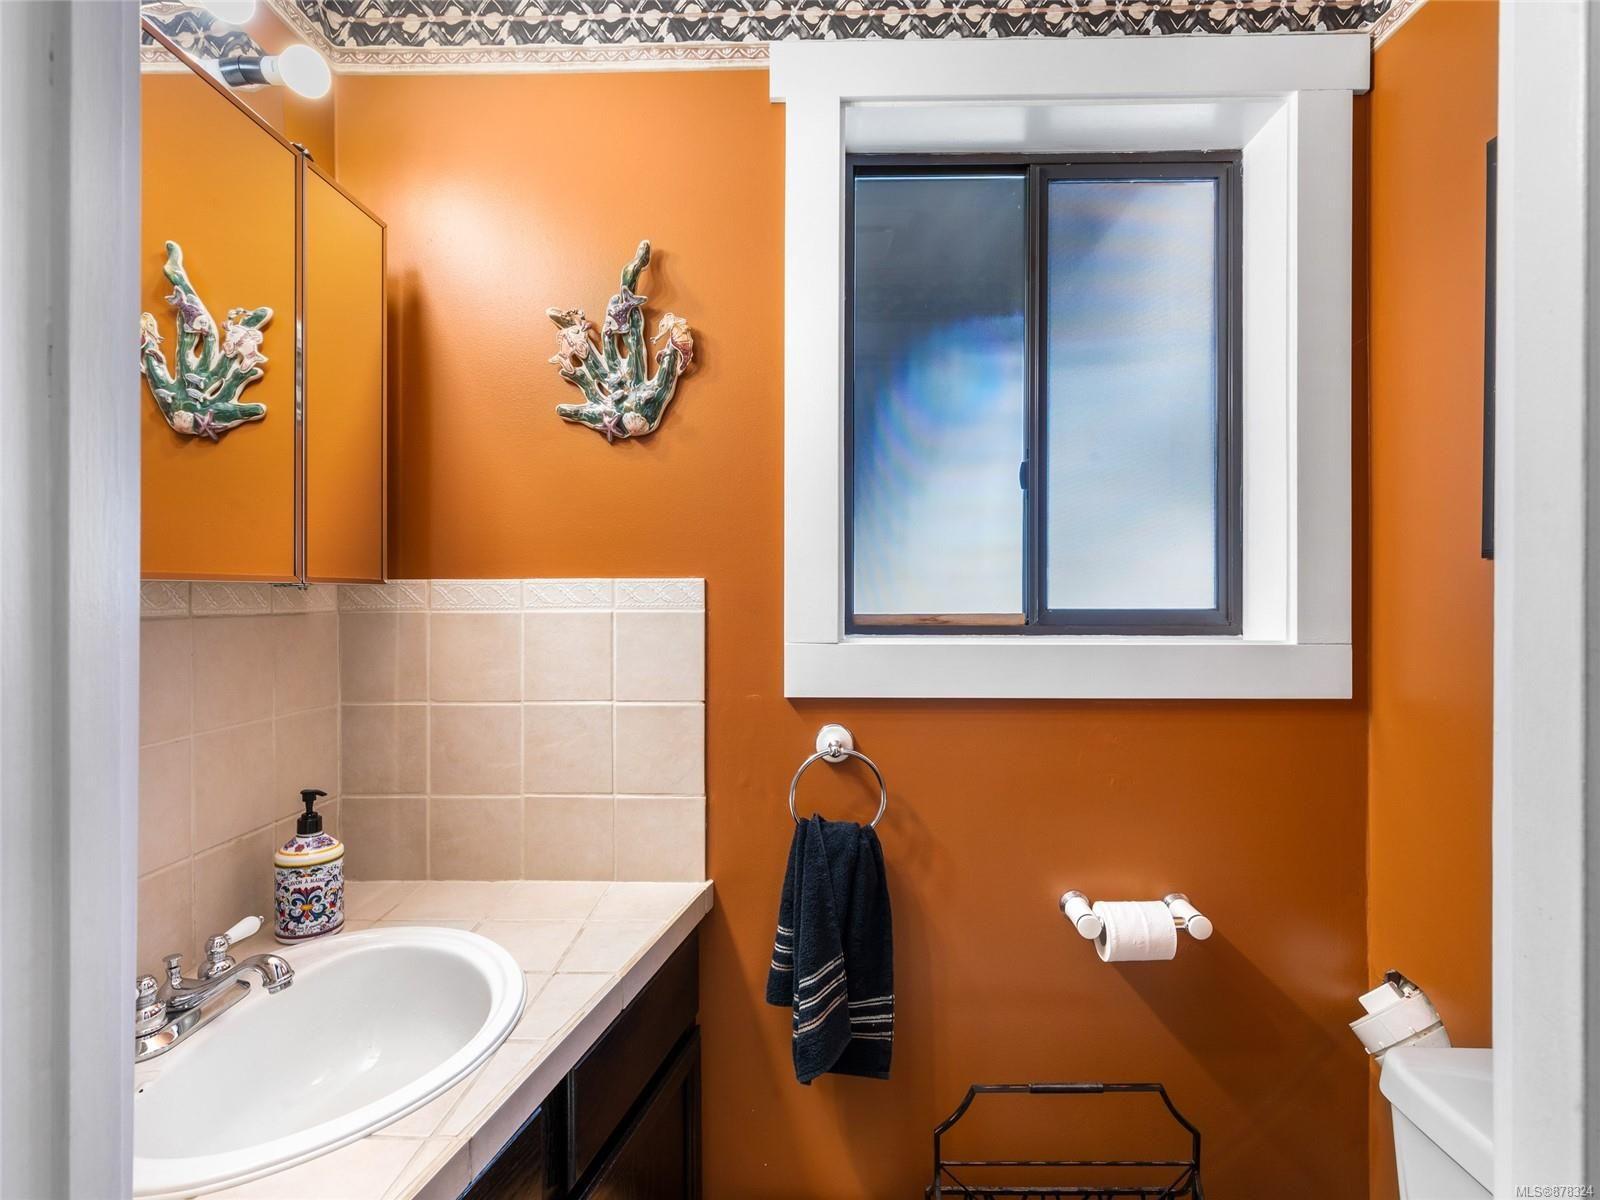 Photo 28: Photos: 3875 Moore Rd in : PA Port Alberni House for sale (Port Alberni)  : MLS®# 878324